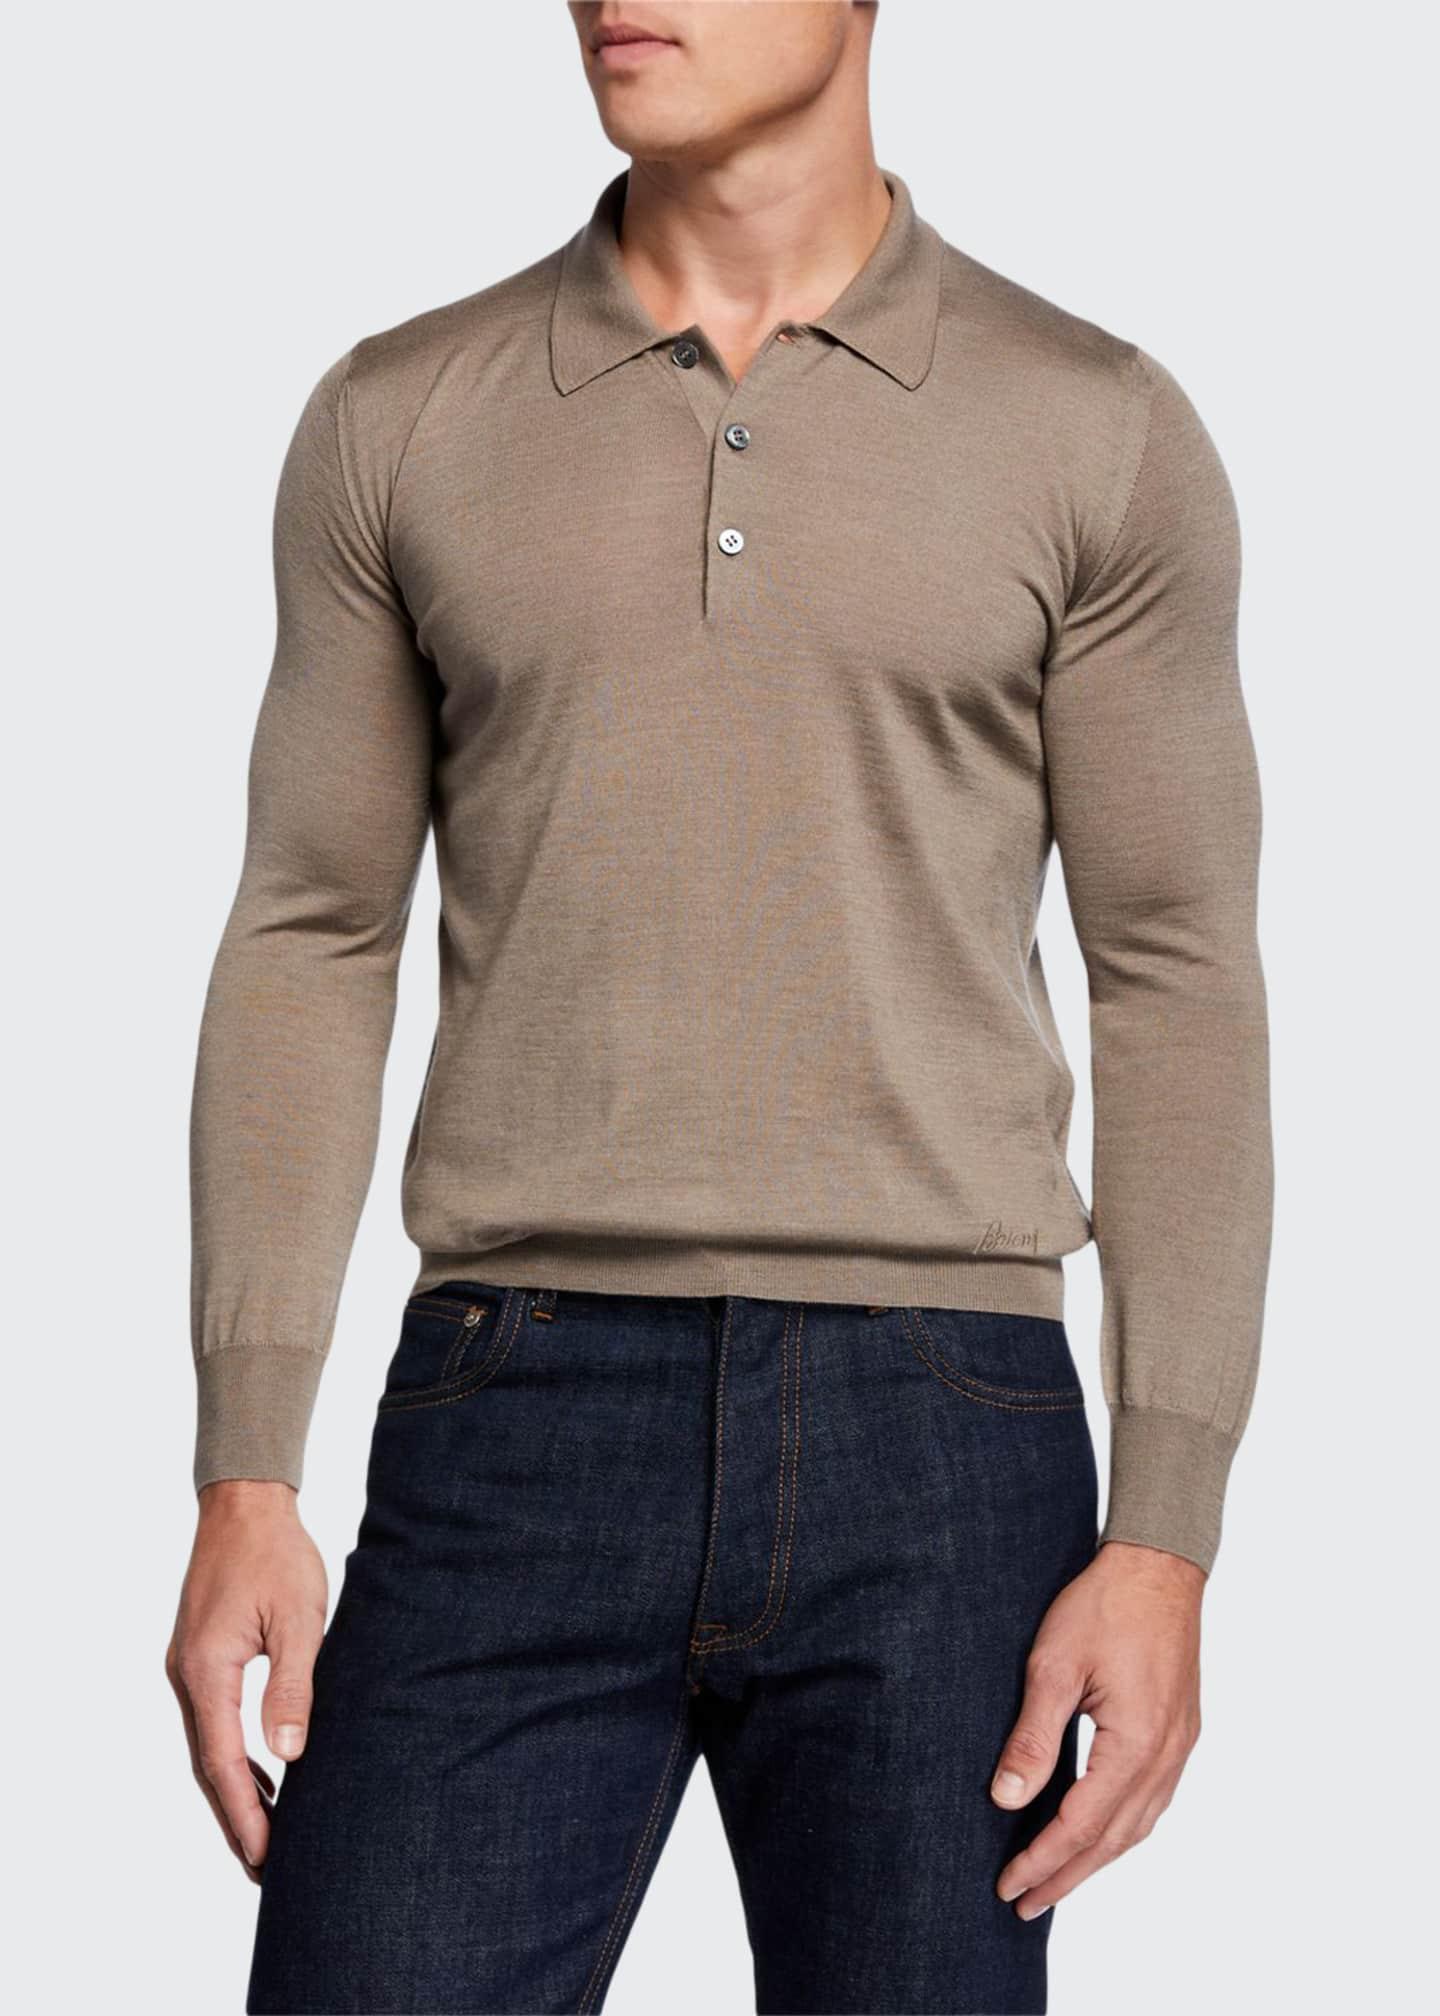 Brioni Men's Long-Sleeve Wool-Silk Polo Shirt